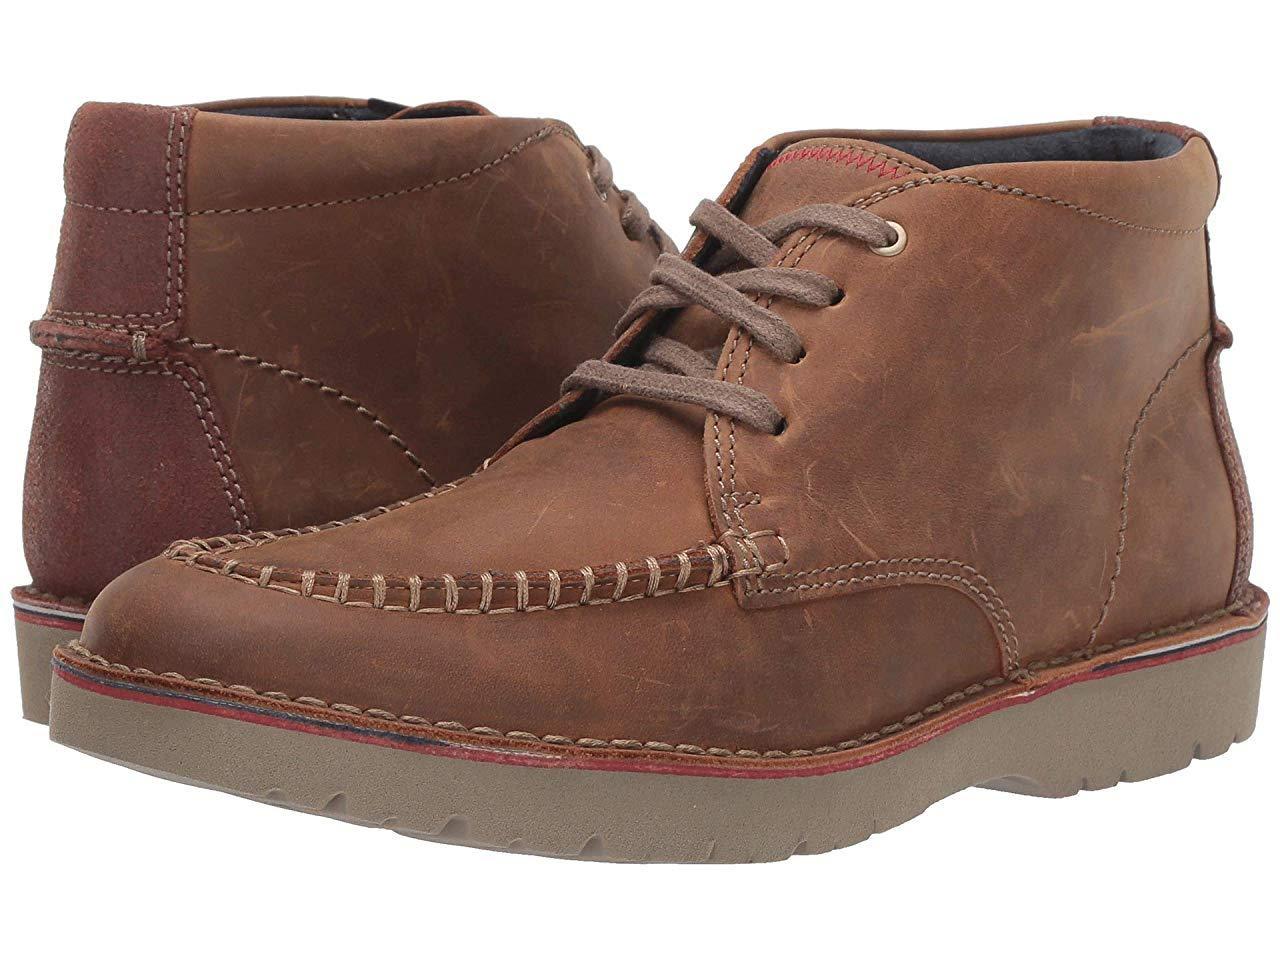 Ботинки/Сапоги (Оригинал) Clarks Vargo Apron Dark Tan Leather